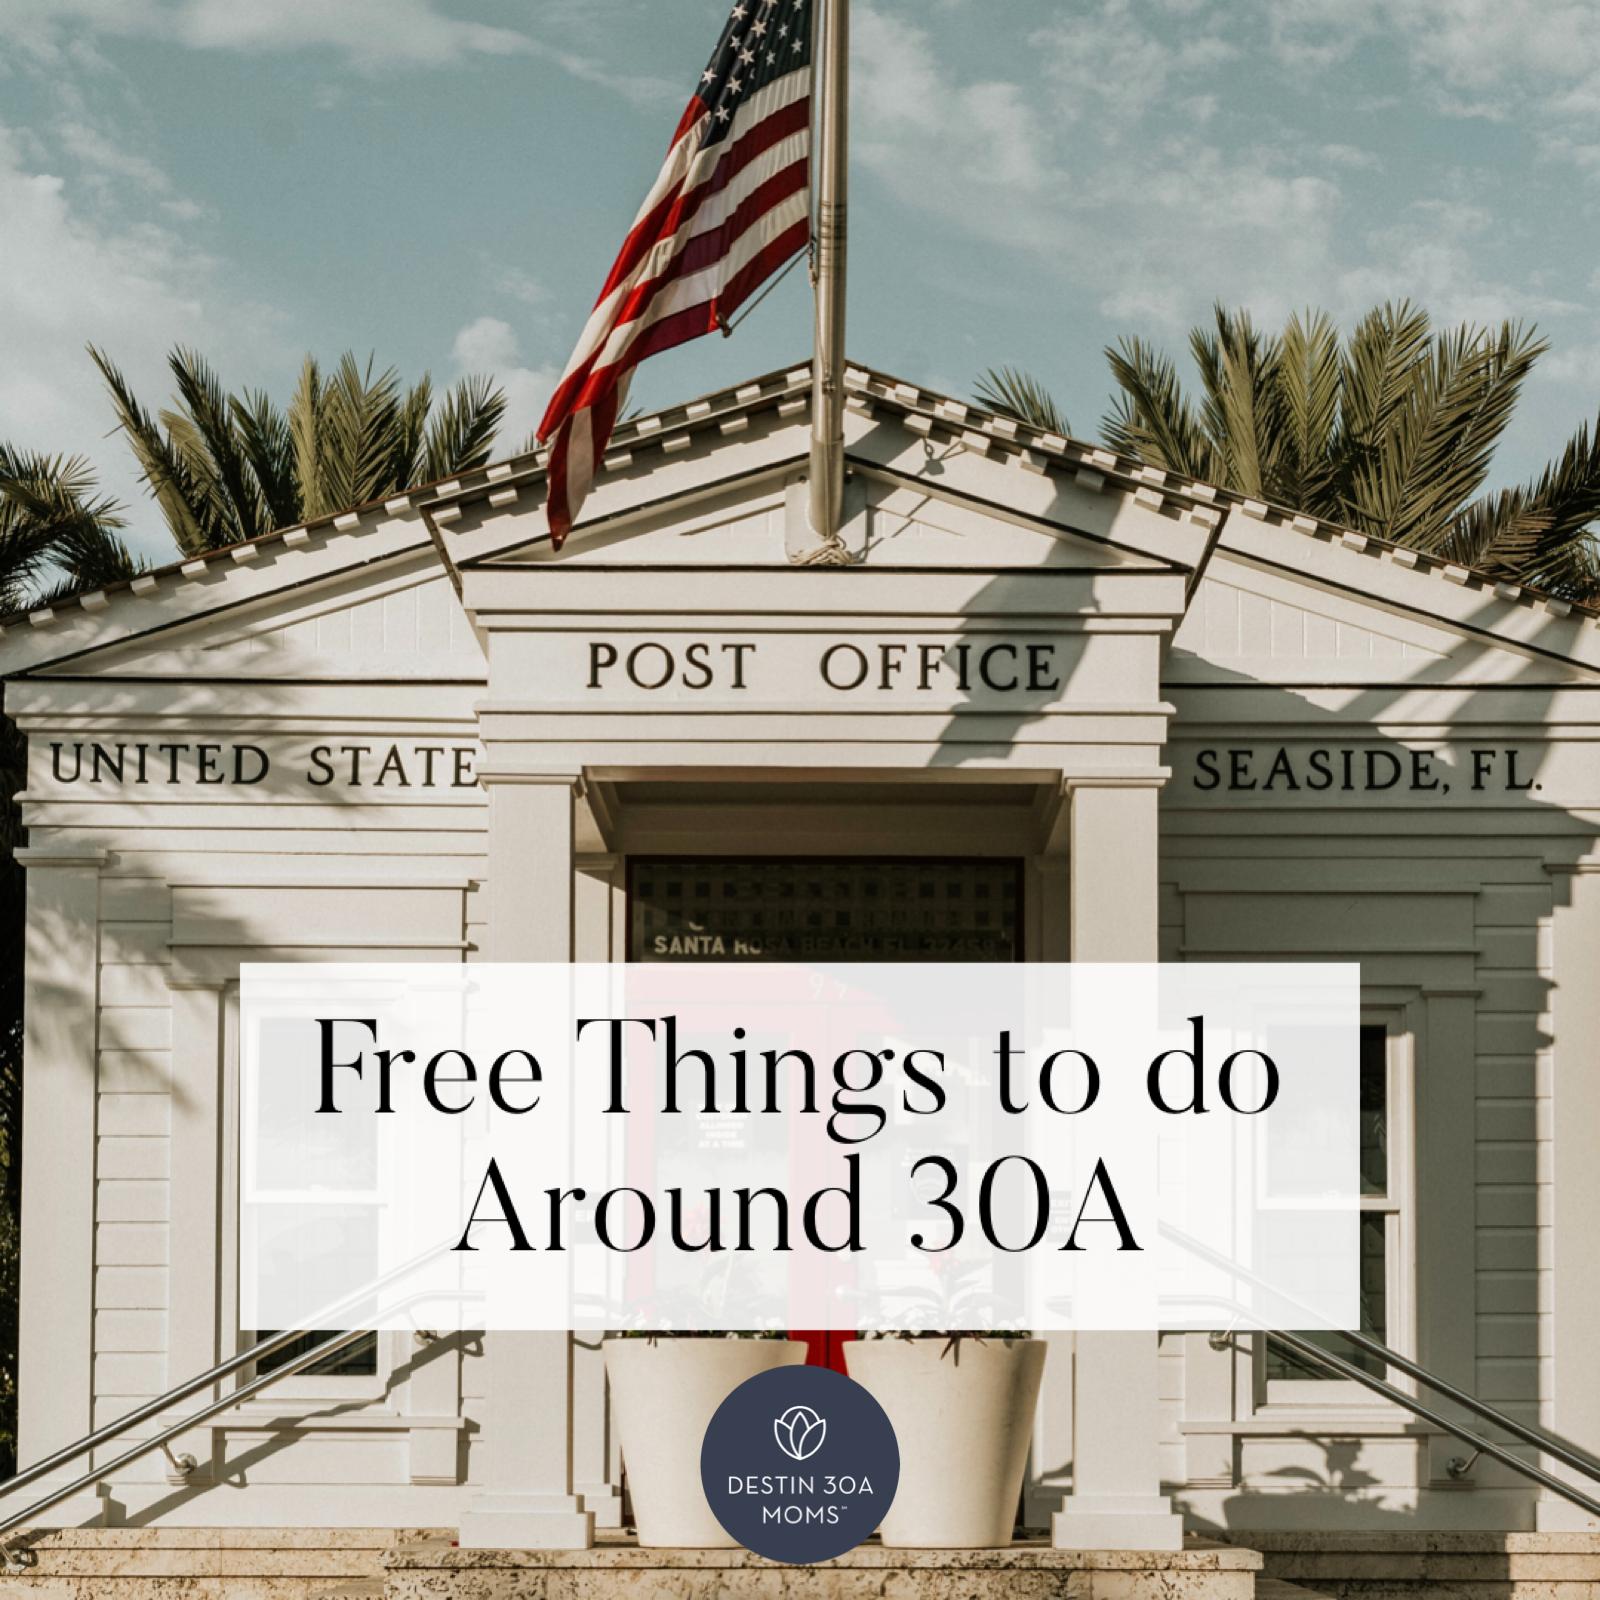 free things to do around 30a